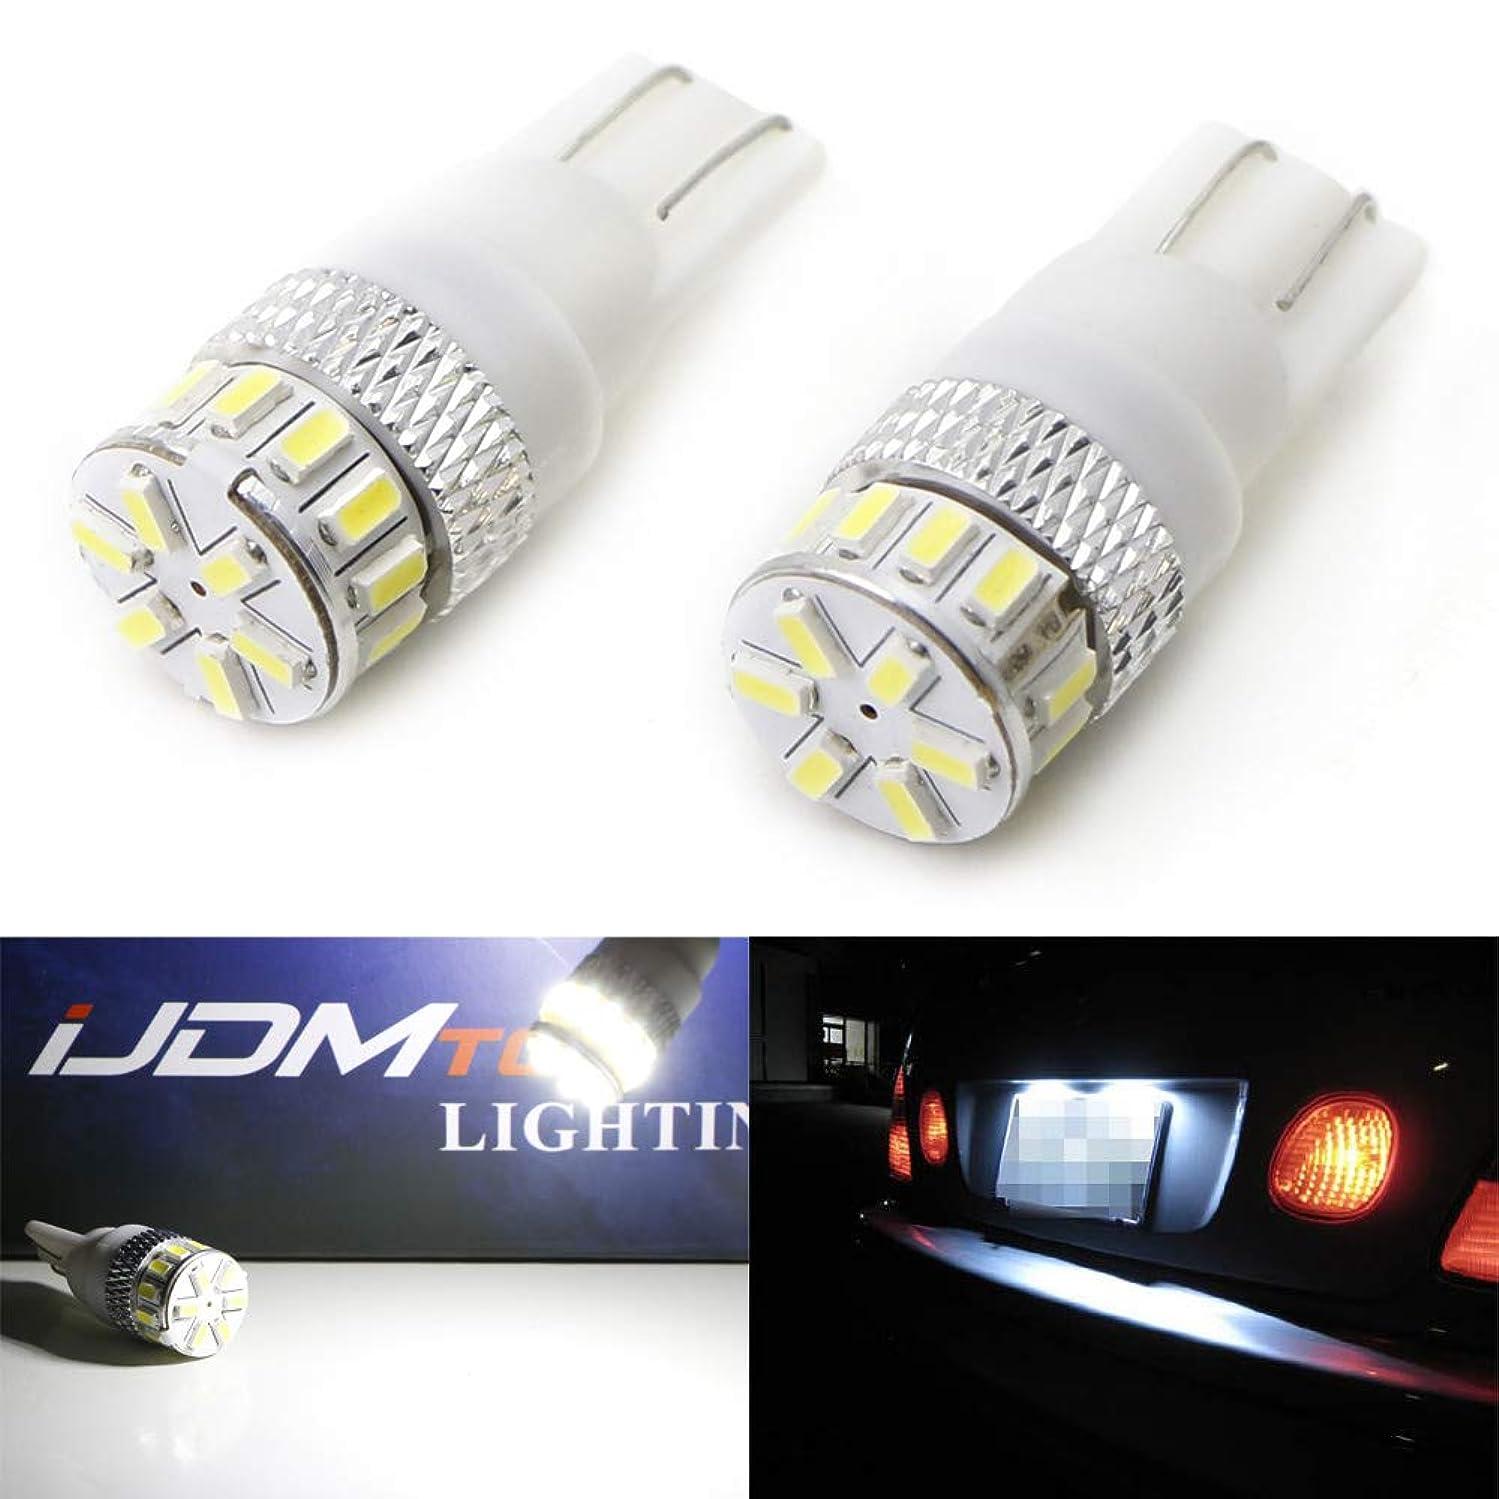 iJDMTOY 12-SMD 168 194 2825 T10 LED License Plate Light Bulbs, Xenon White